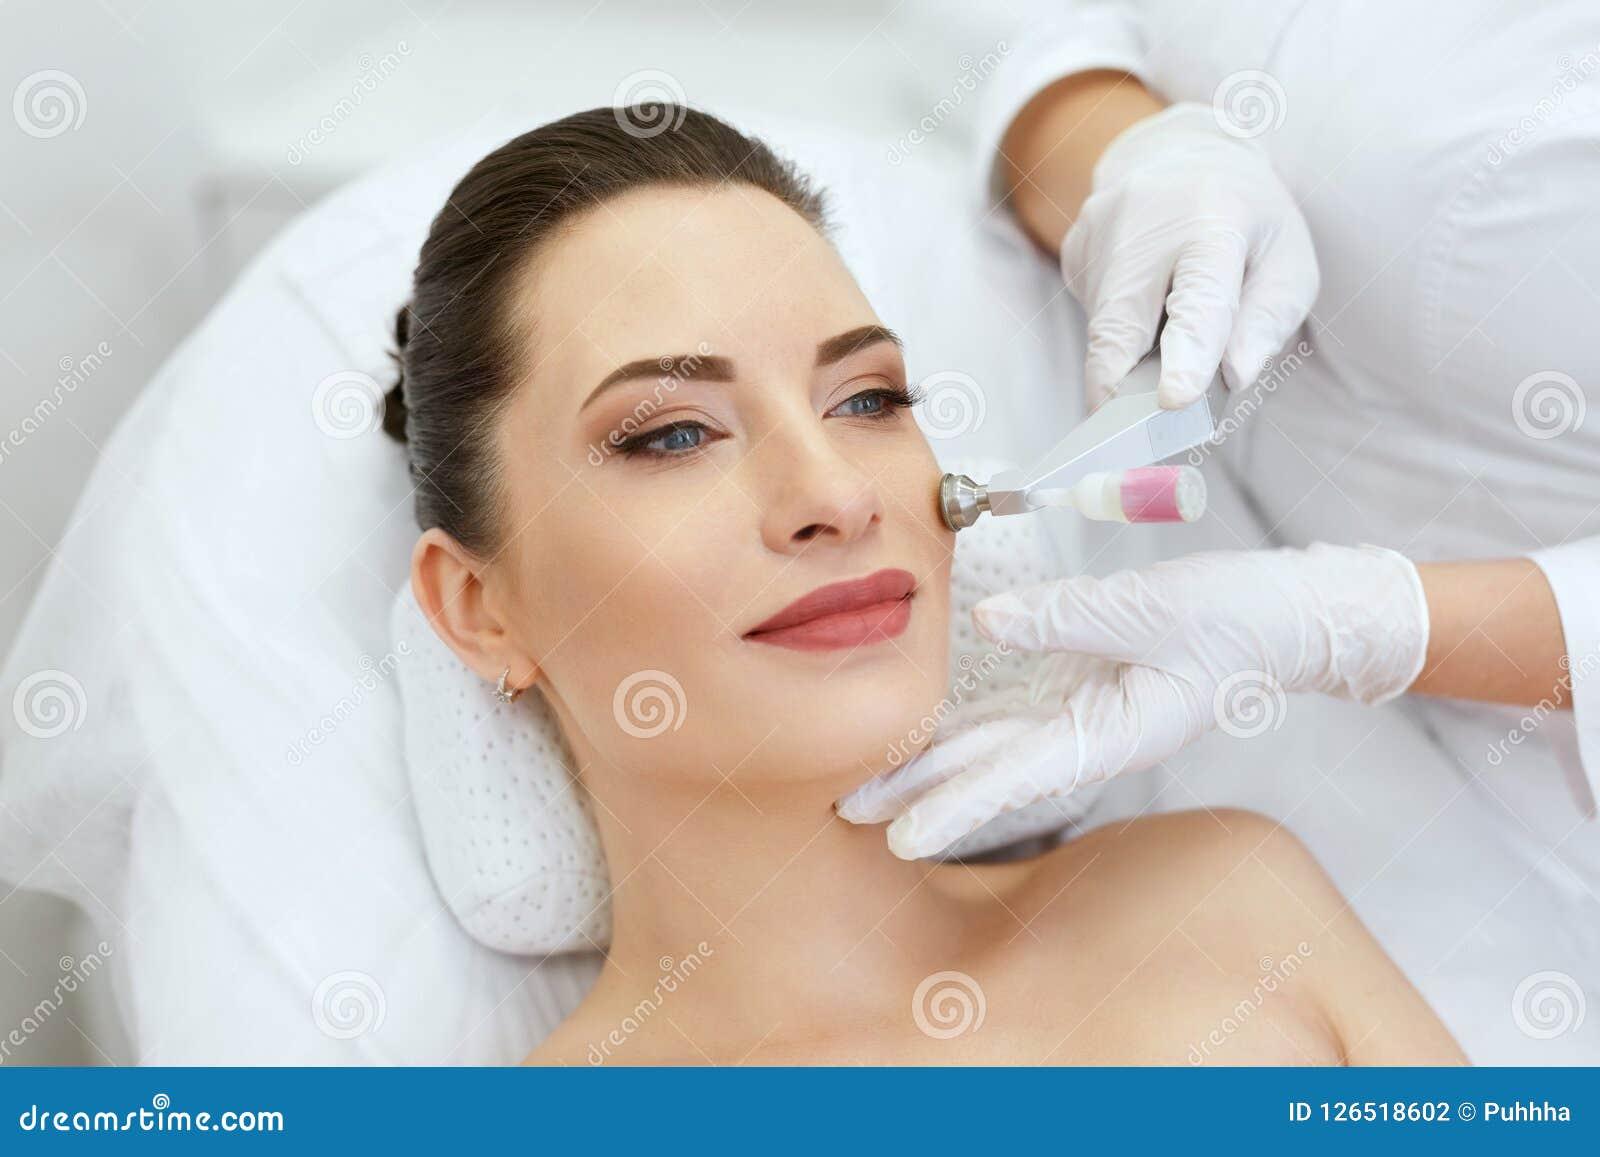 Beauty Clinic. Woman Doing Face Skin Cryo Oxygen Treatment